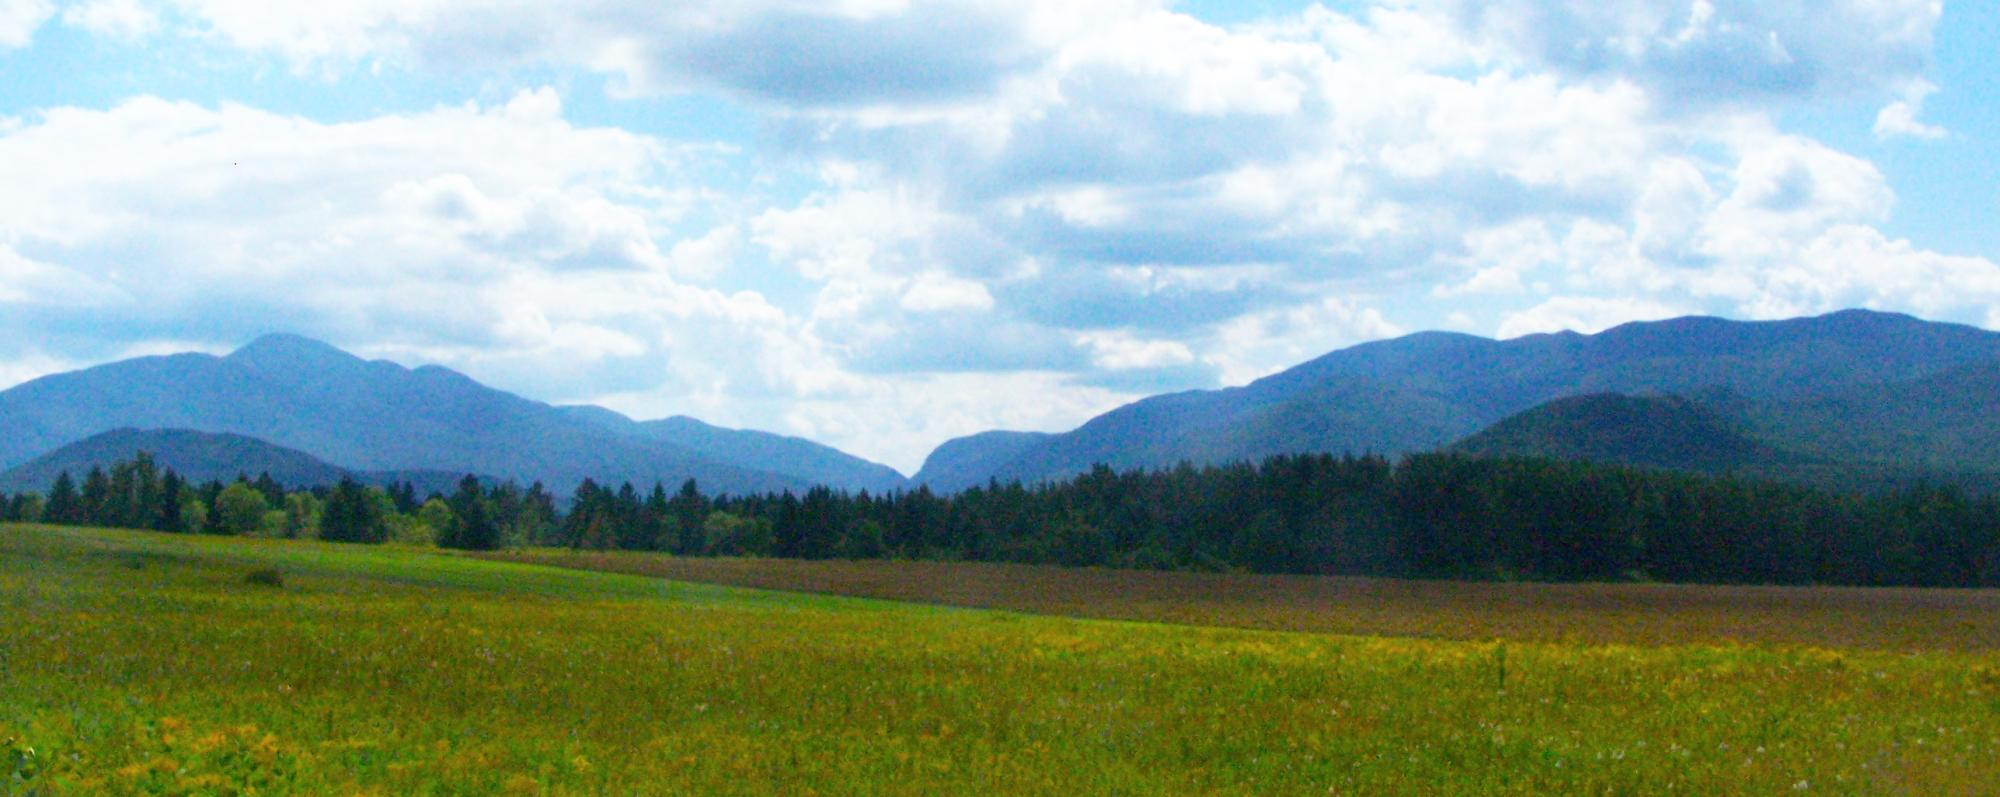 Landscape of Adirondack High Peaks